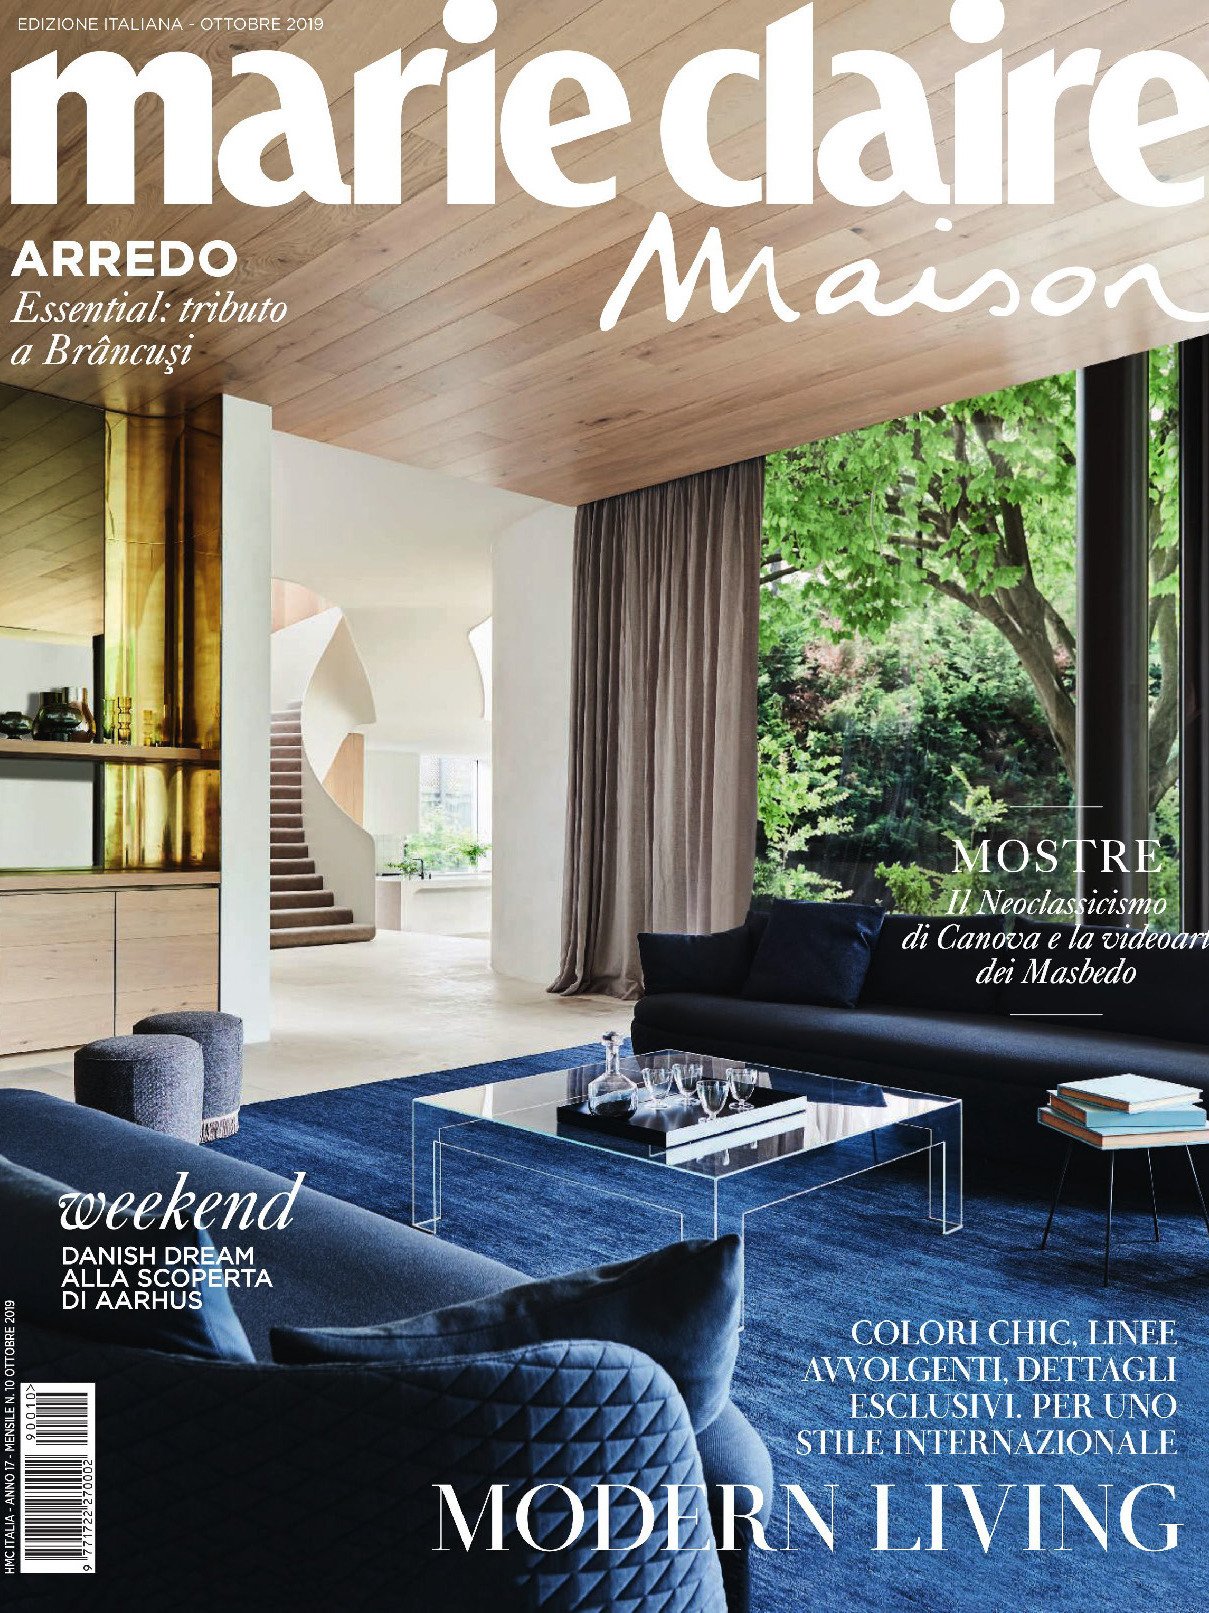 《Marie Claire maison》意大利版时尚室内设计杂志2019年10号